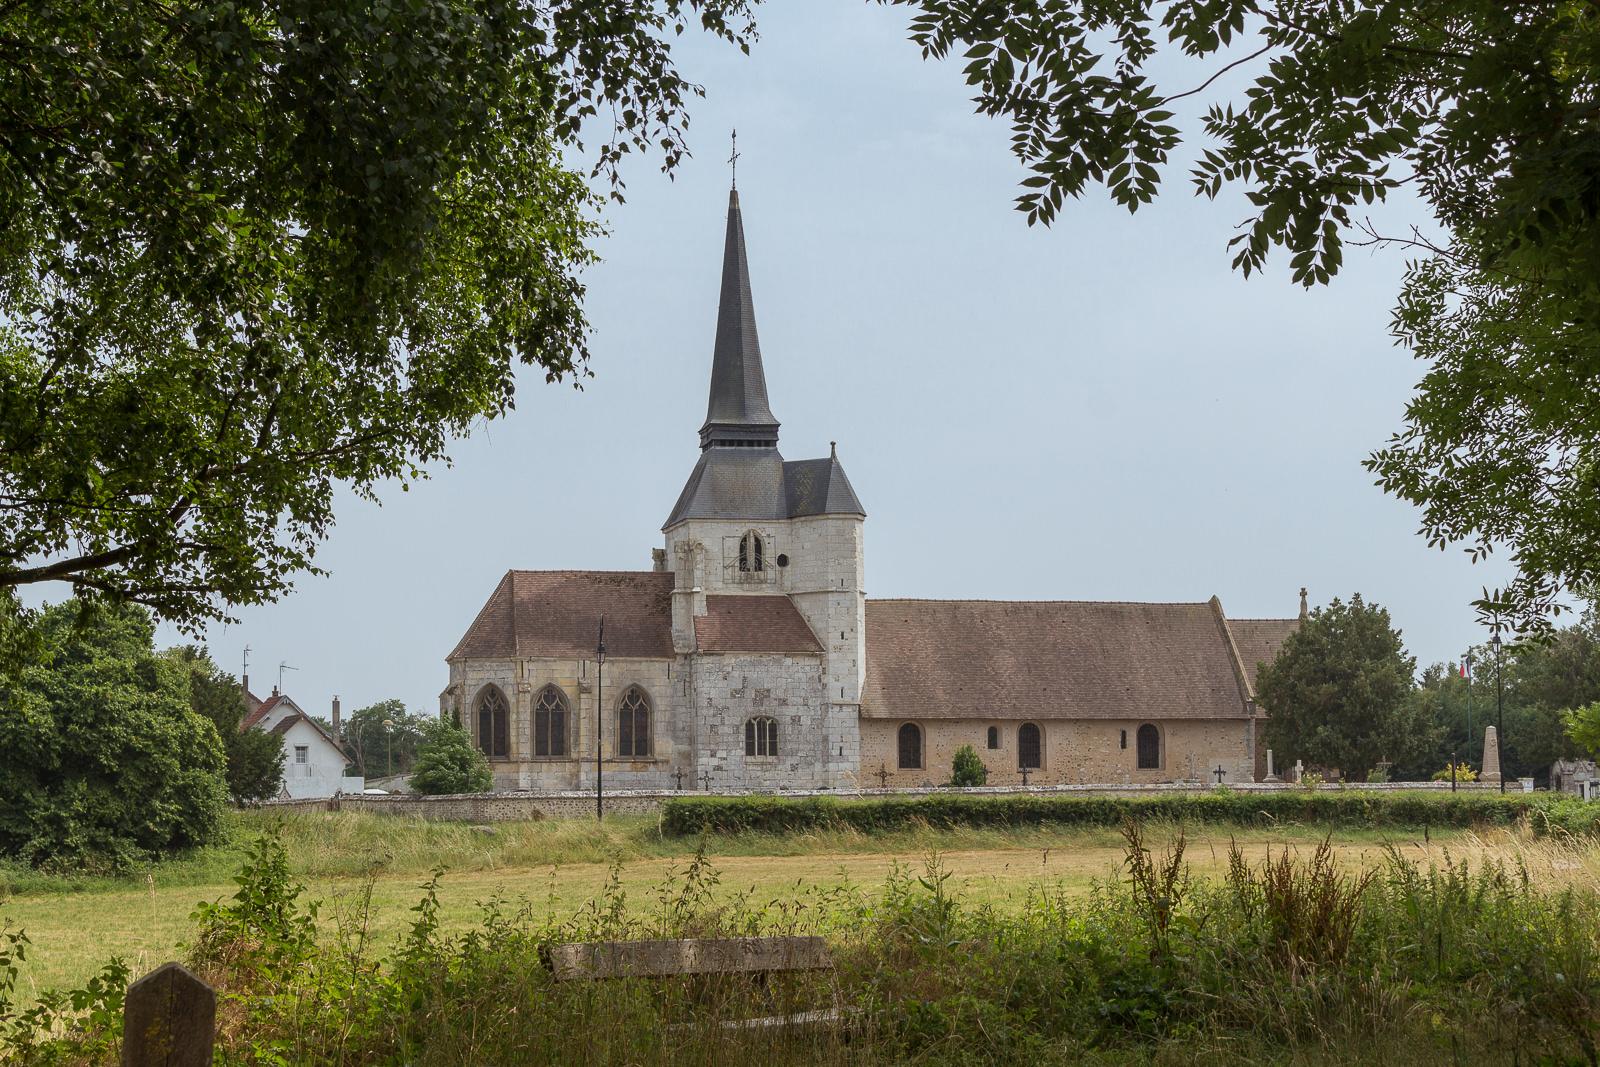 Poses, Kirche, Seefahrer